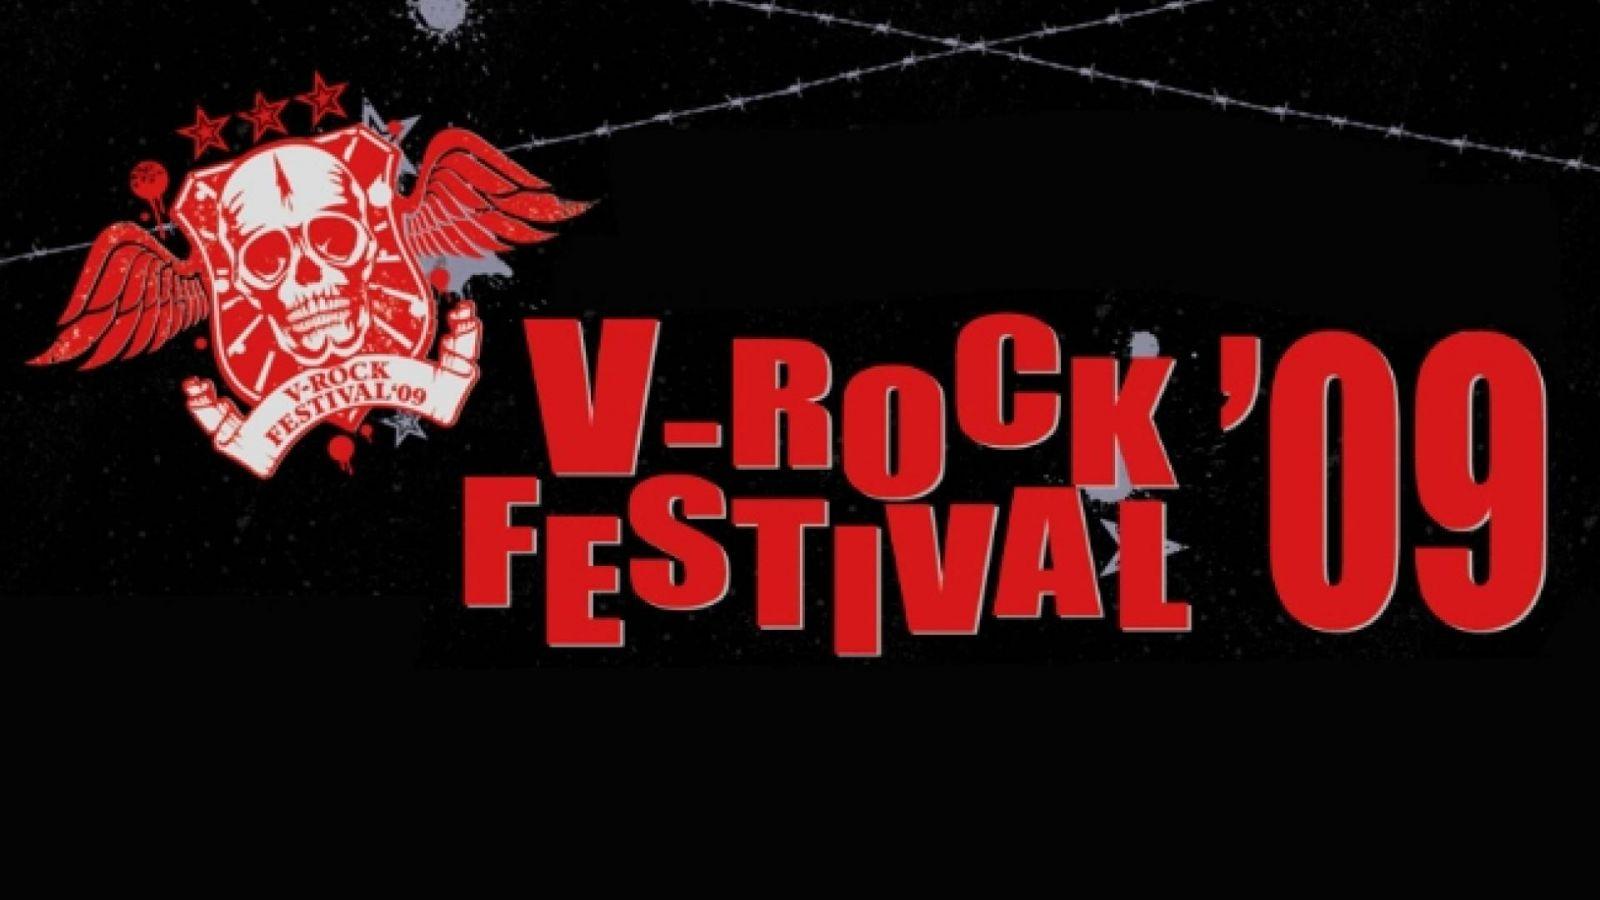 Live Broadcast of V-ROCK FESTIVAL09 - Updated © Backstage Project